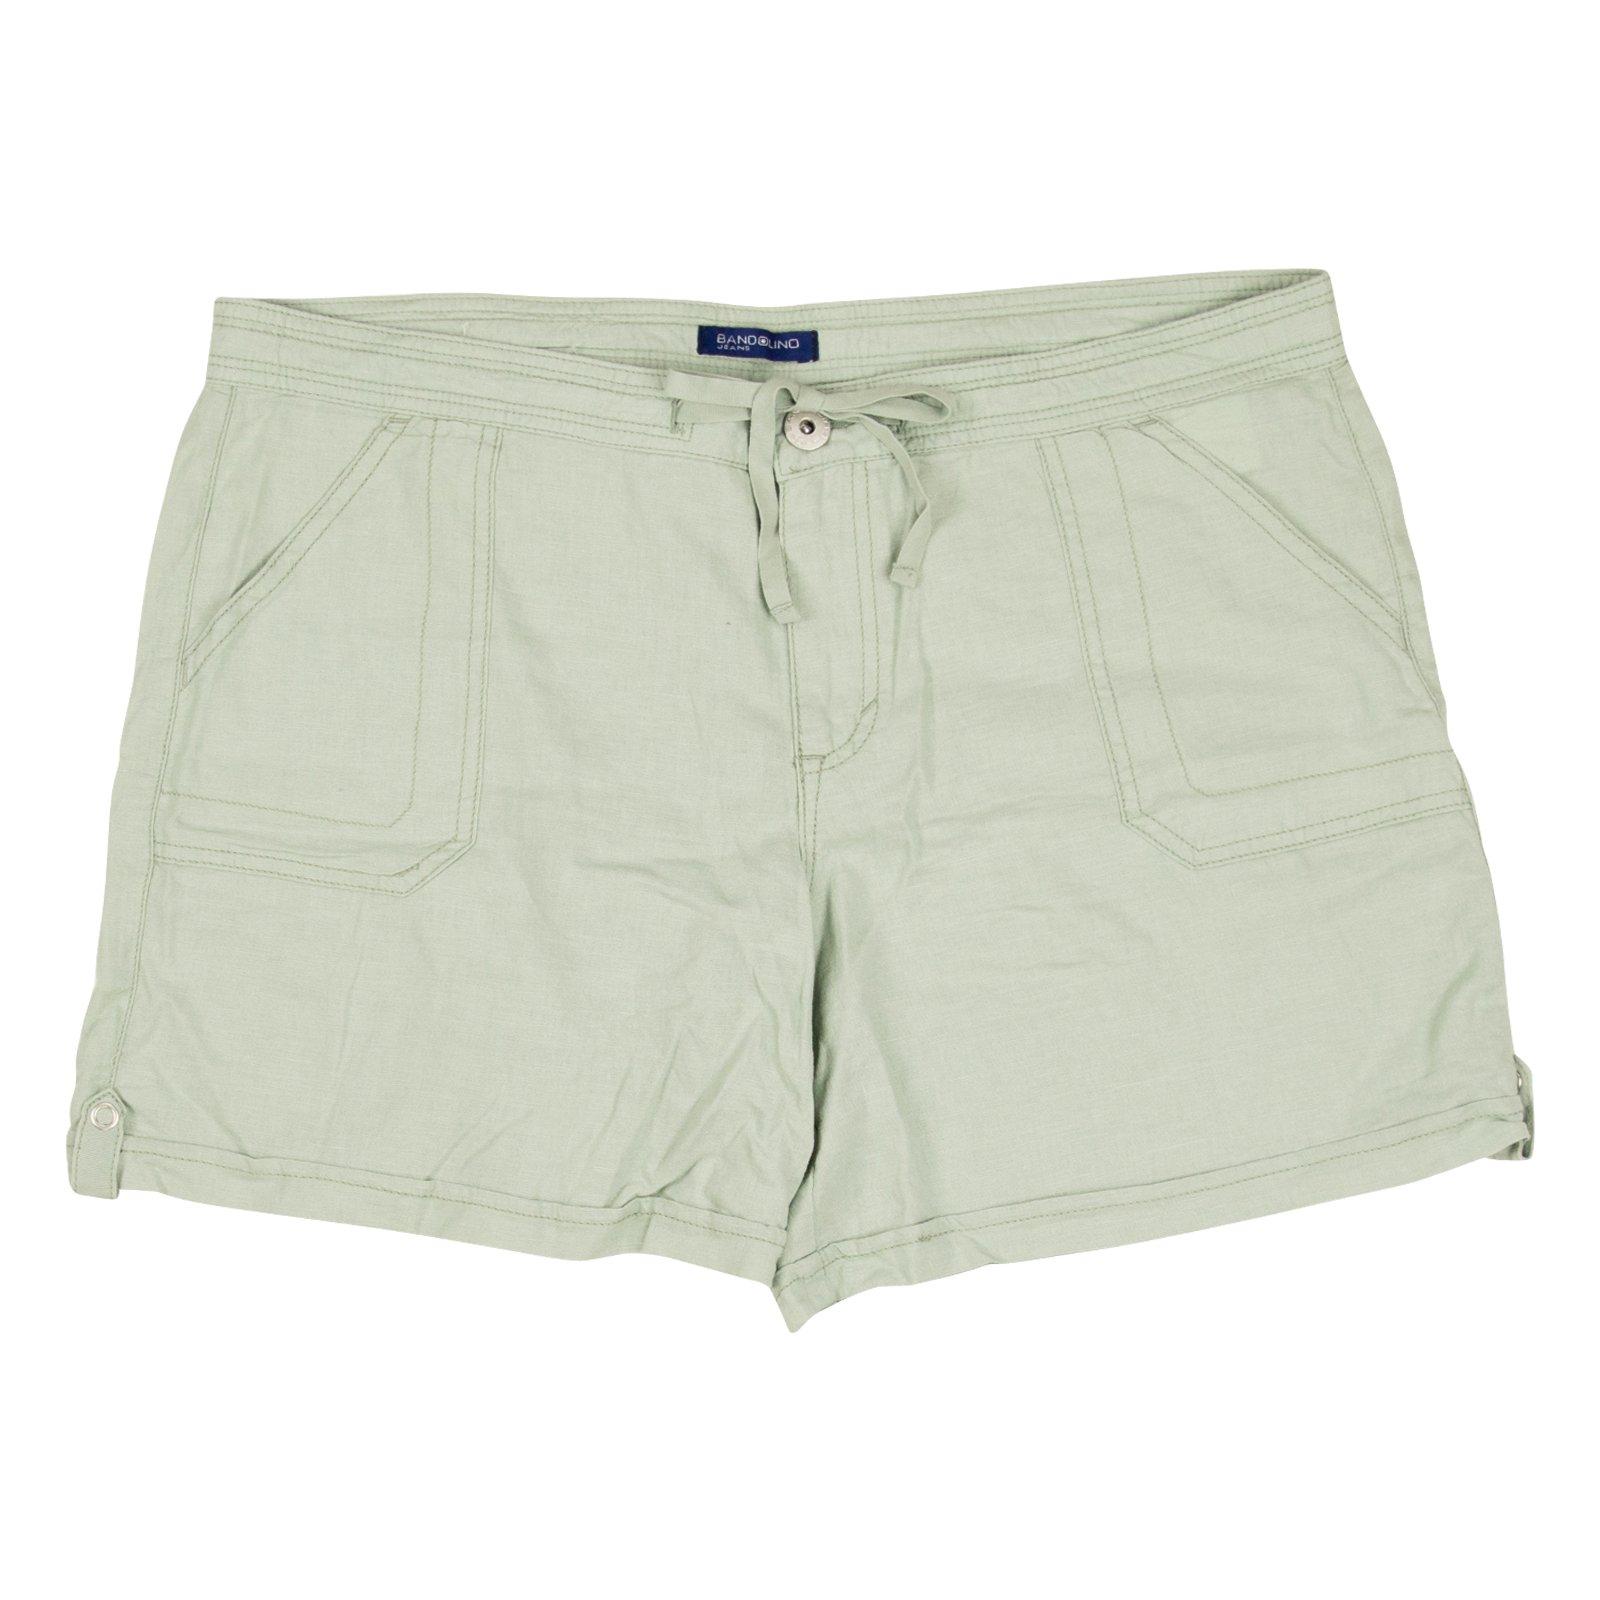 Bandolino Womens Iris Soft Shorts 14 Sedona Sage